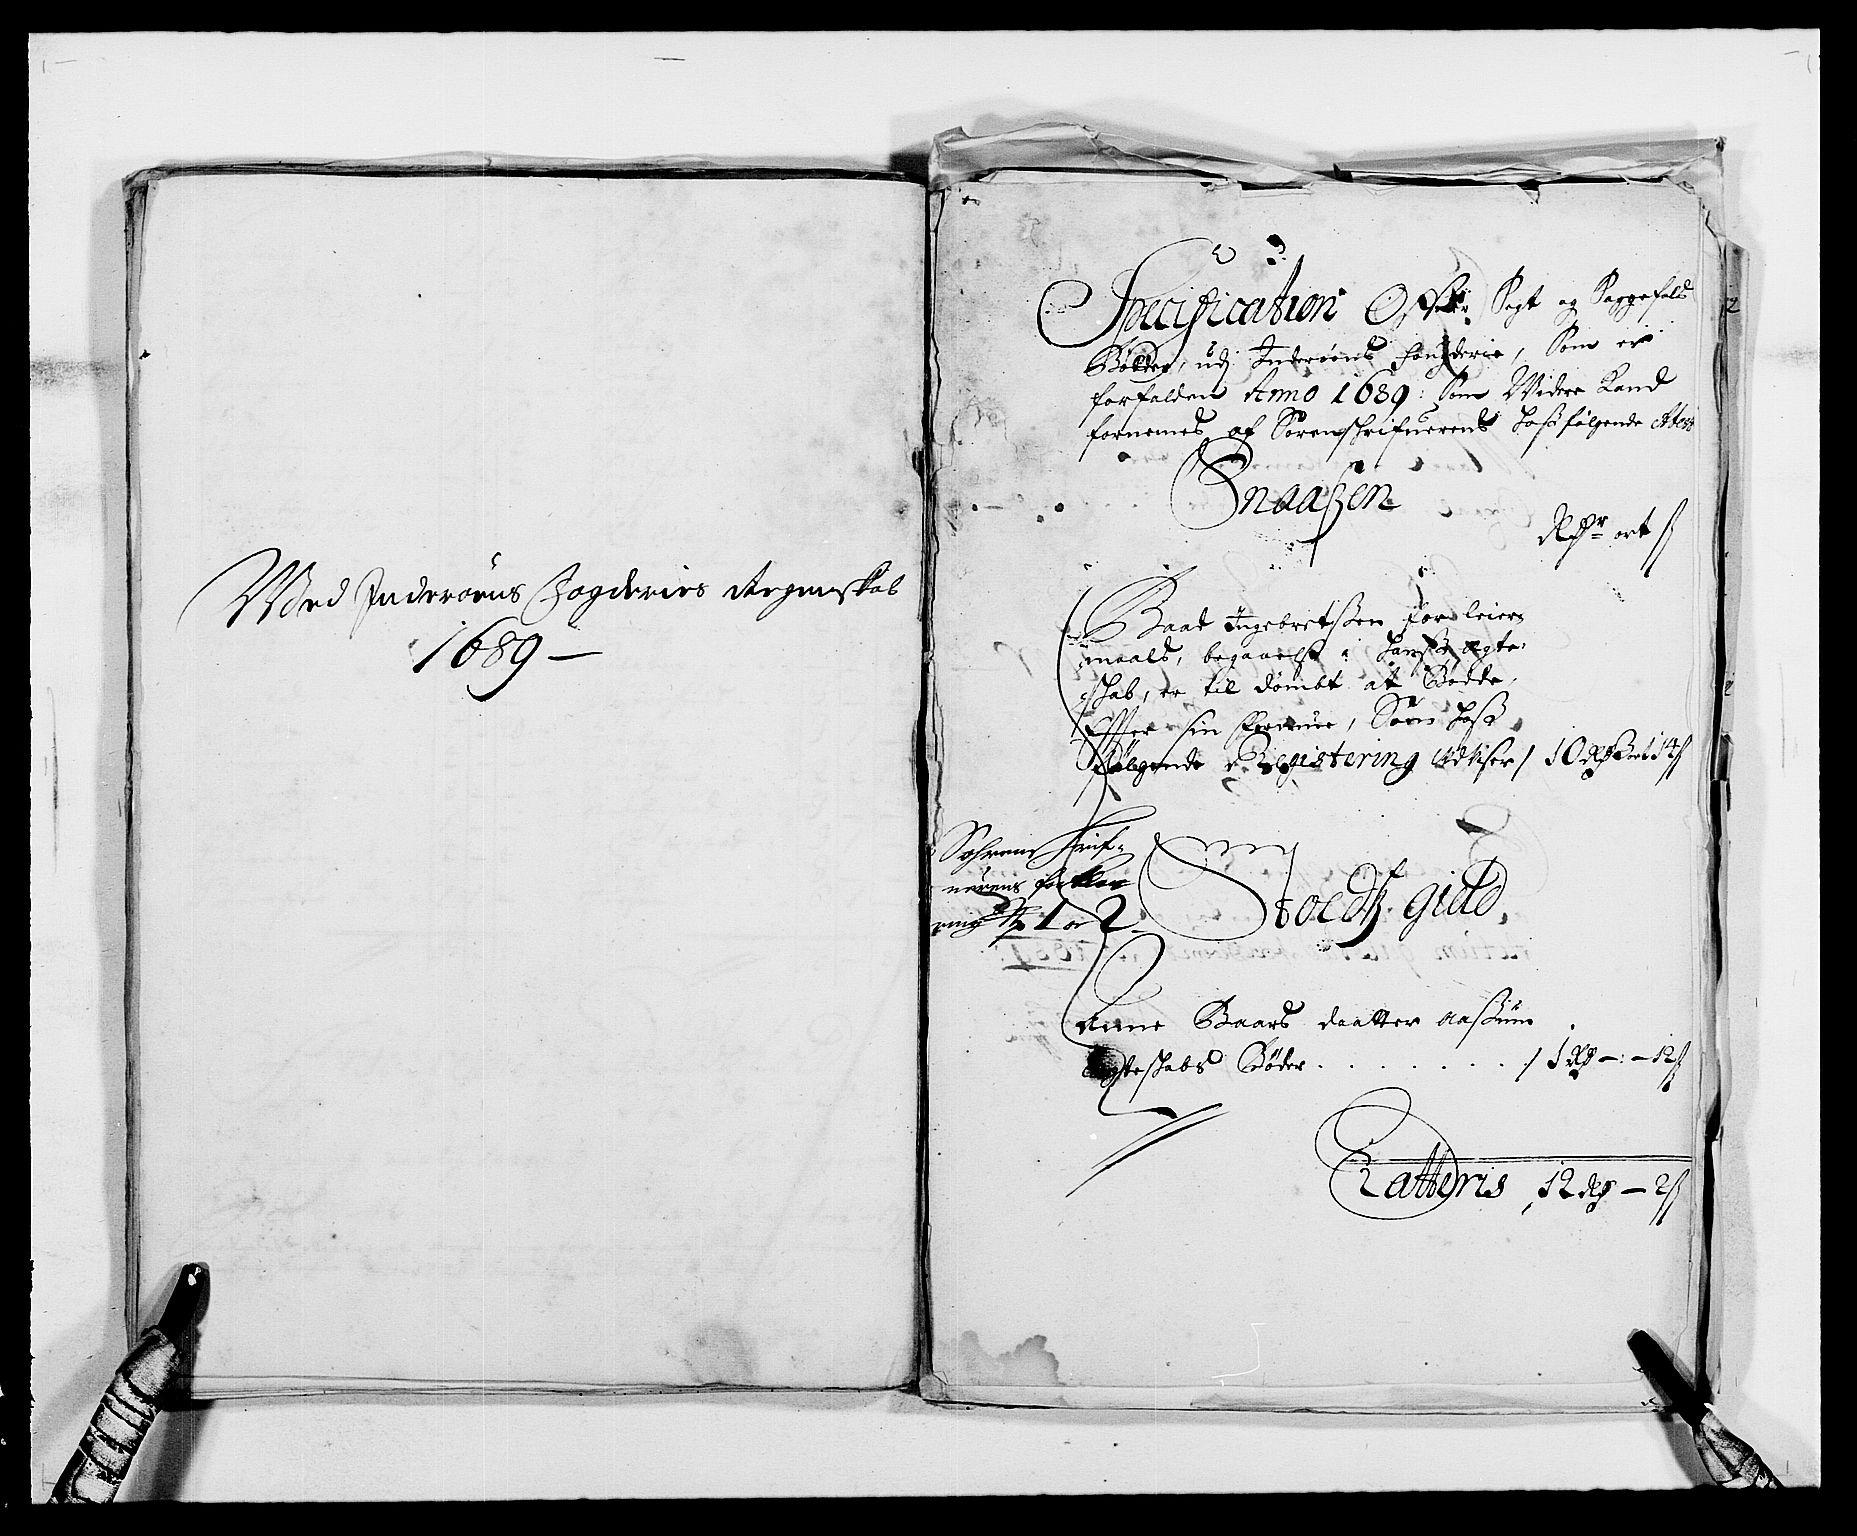 RA, Rentekammeret inntil 1814, Reviderte regnskaper, Fogderegnskap, R63/L4306: Fogderegnskap Inderøy, 1687-1689, s. 480